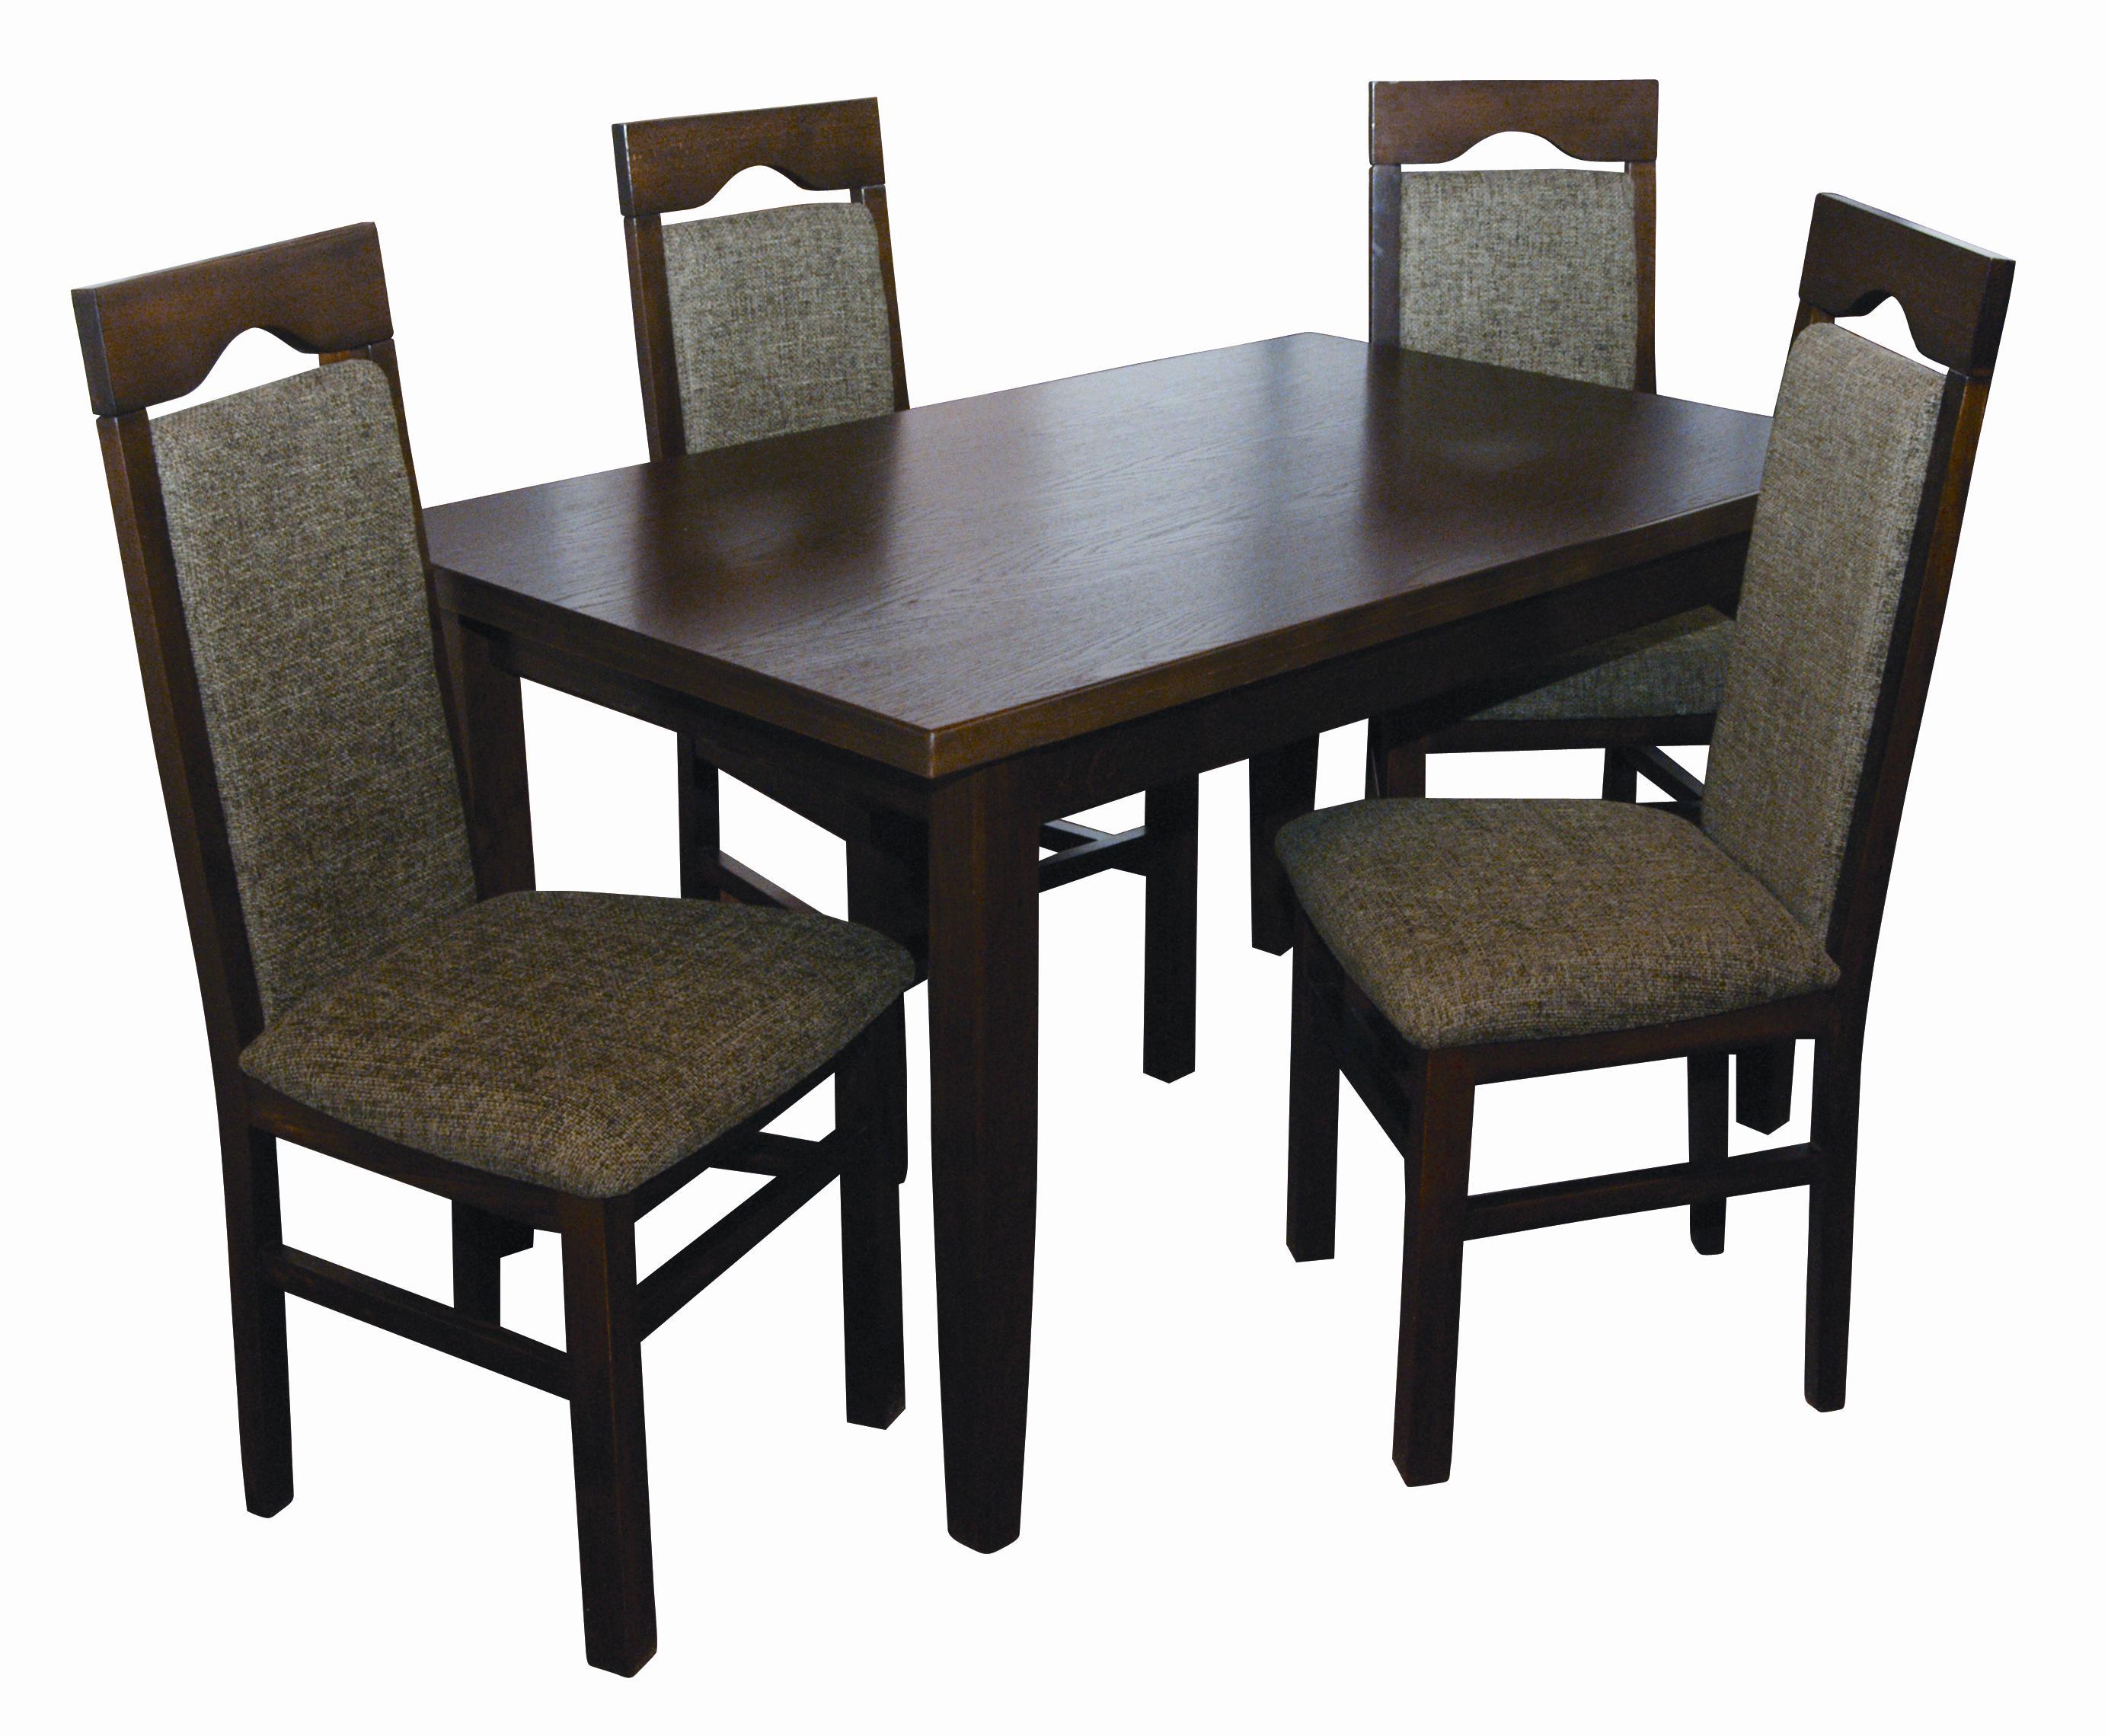 chaises de restaurant design 0 0 2000 0 pi ces. Black Bedroom Furniture Sets. Home Design Ideas